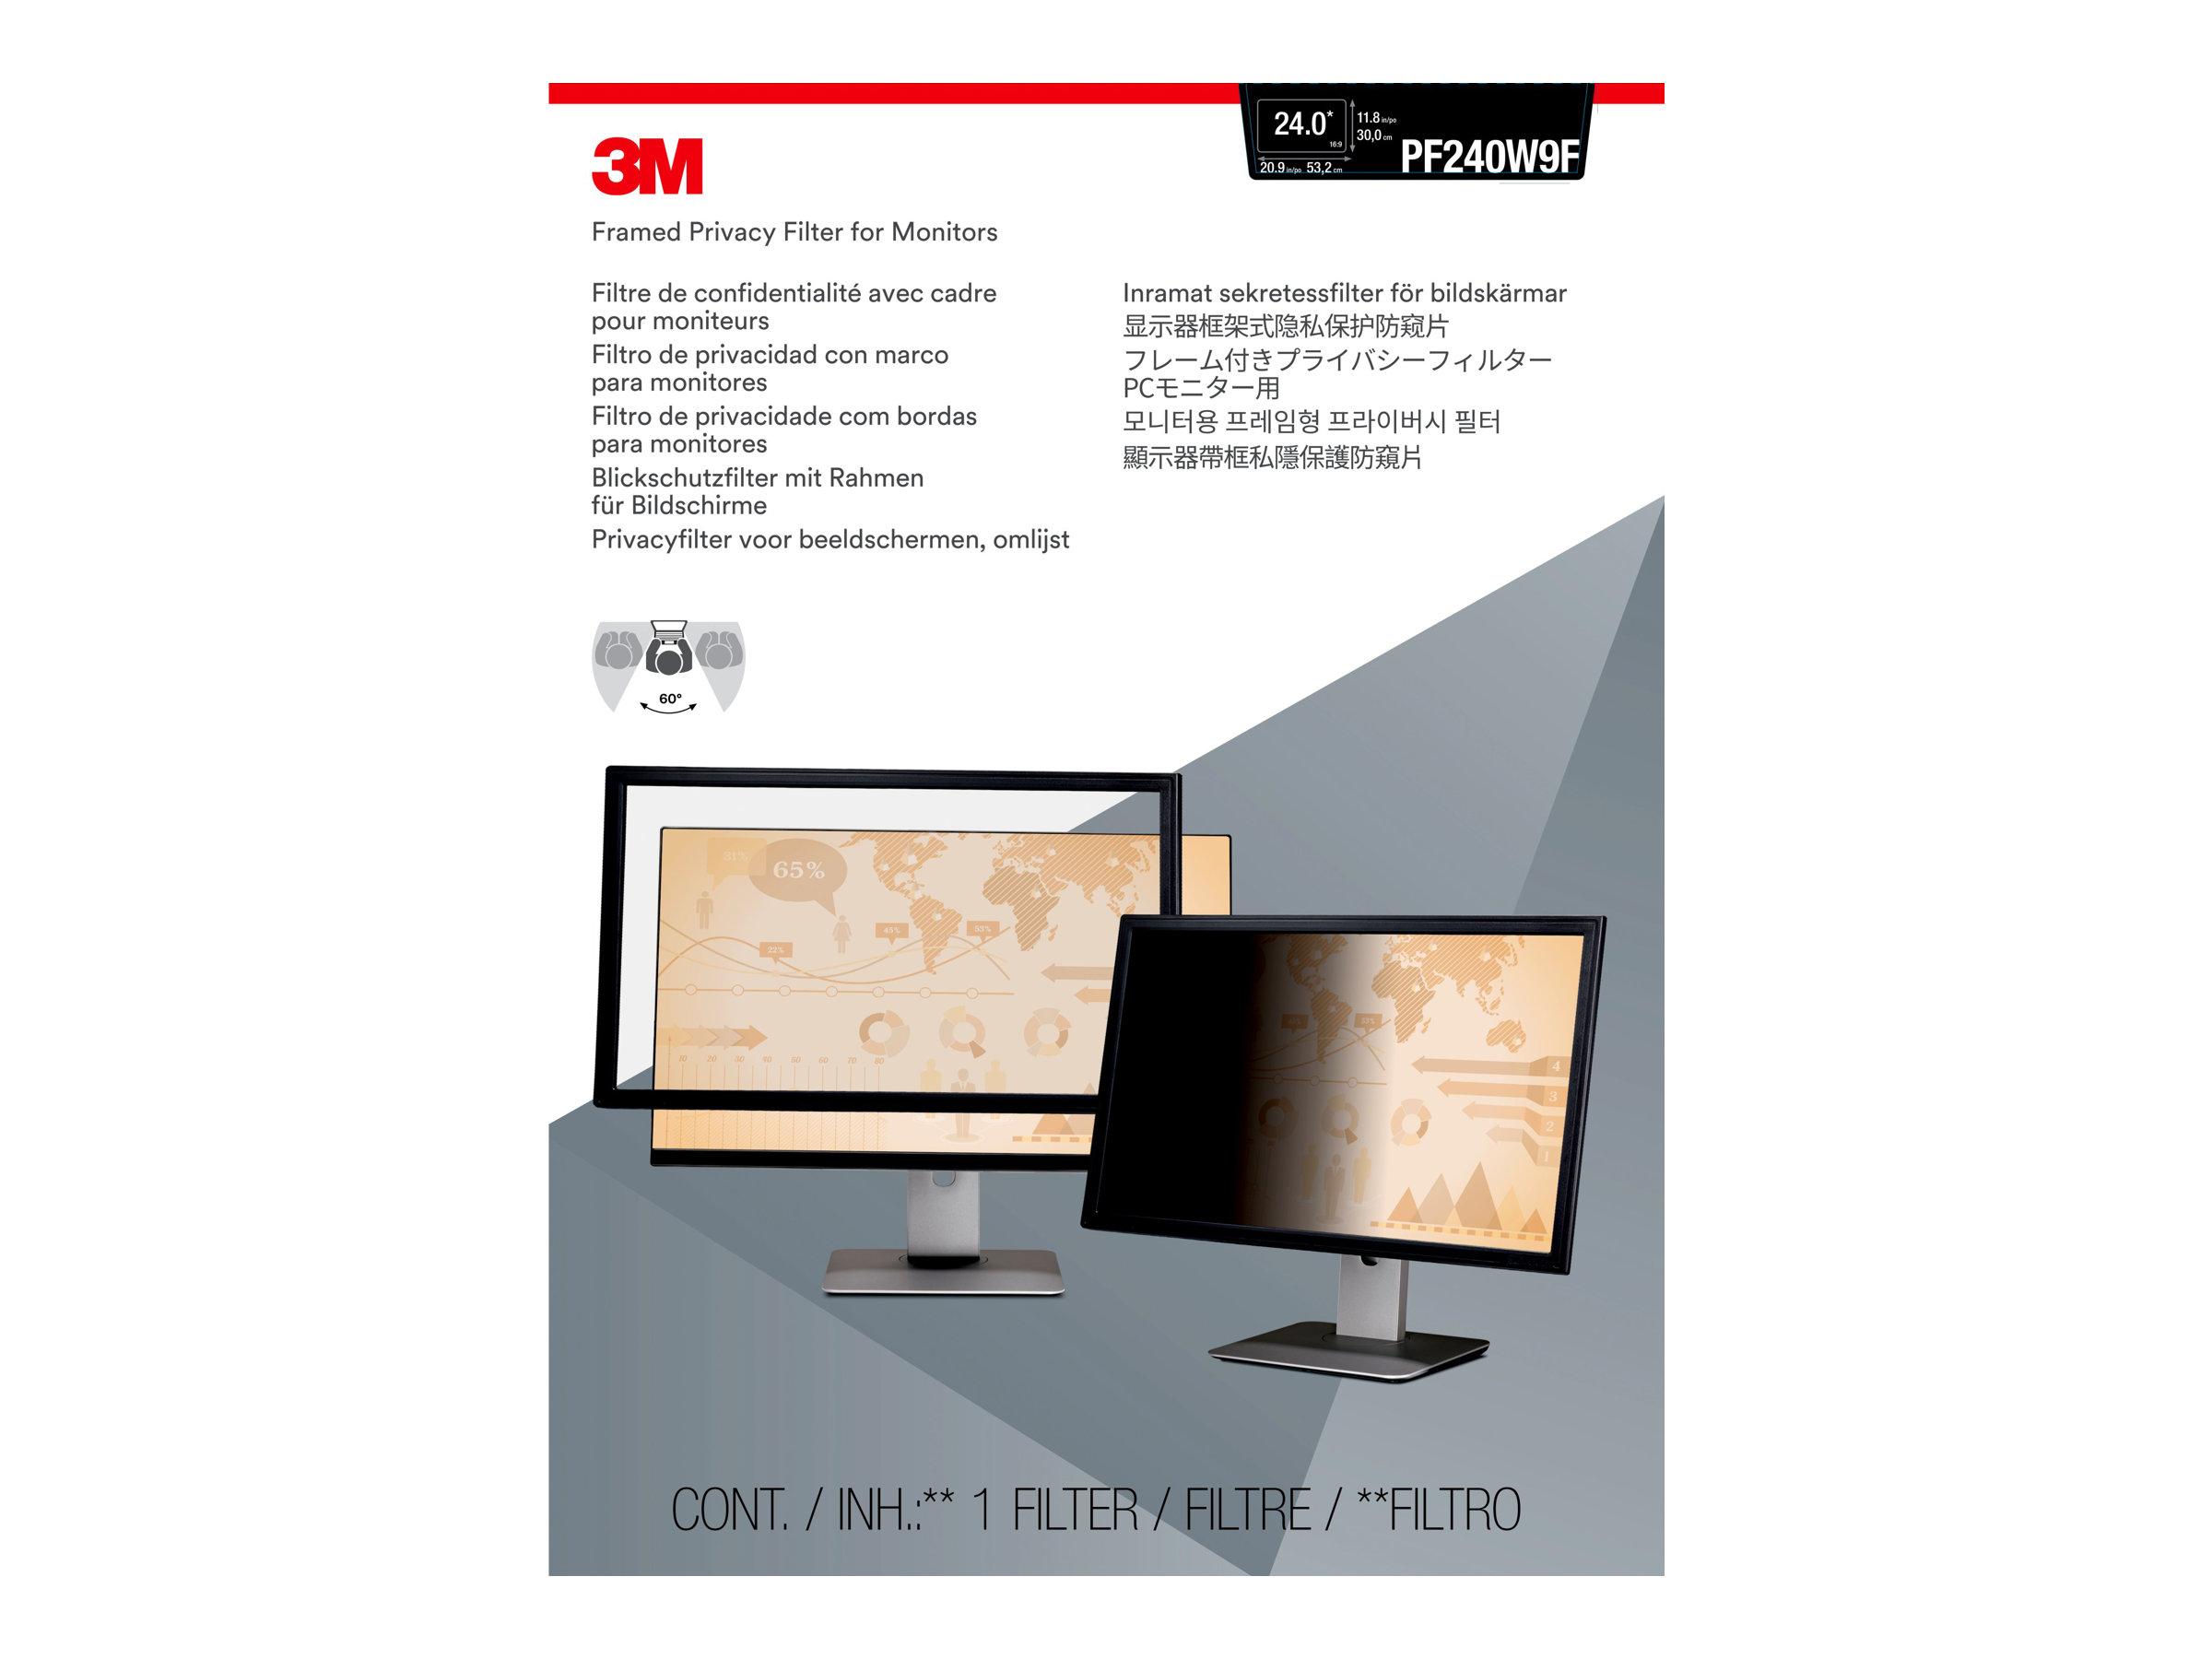 3M Framed Privacy Filter for 24